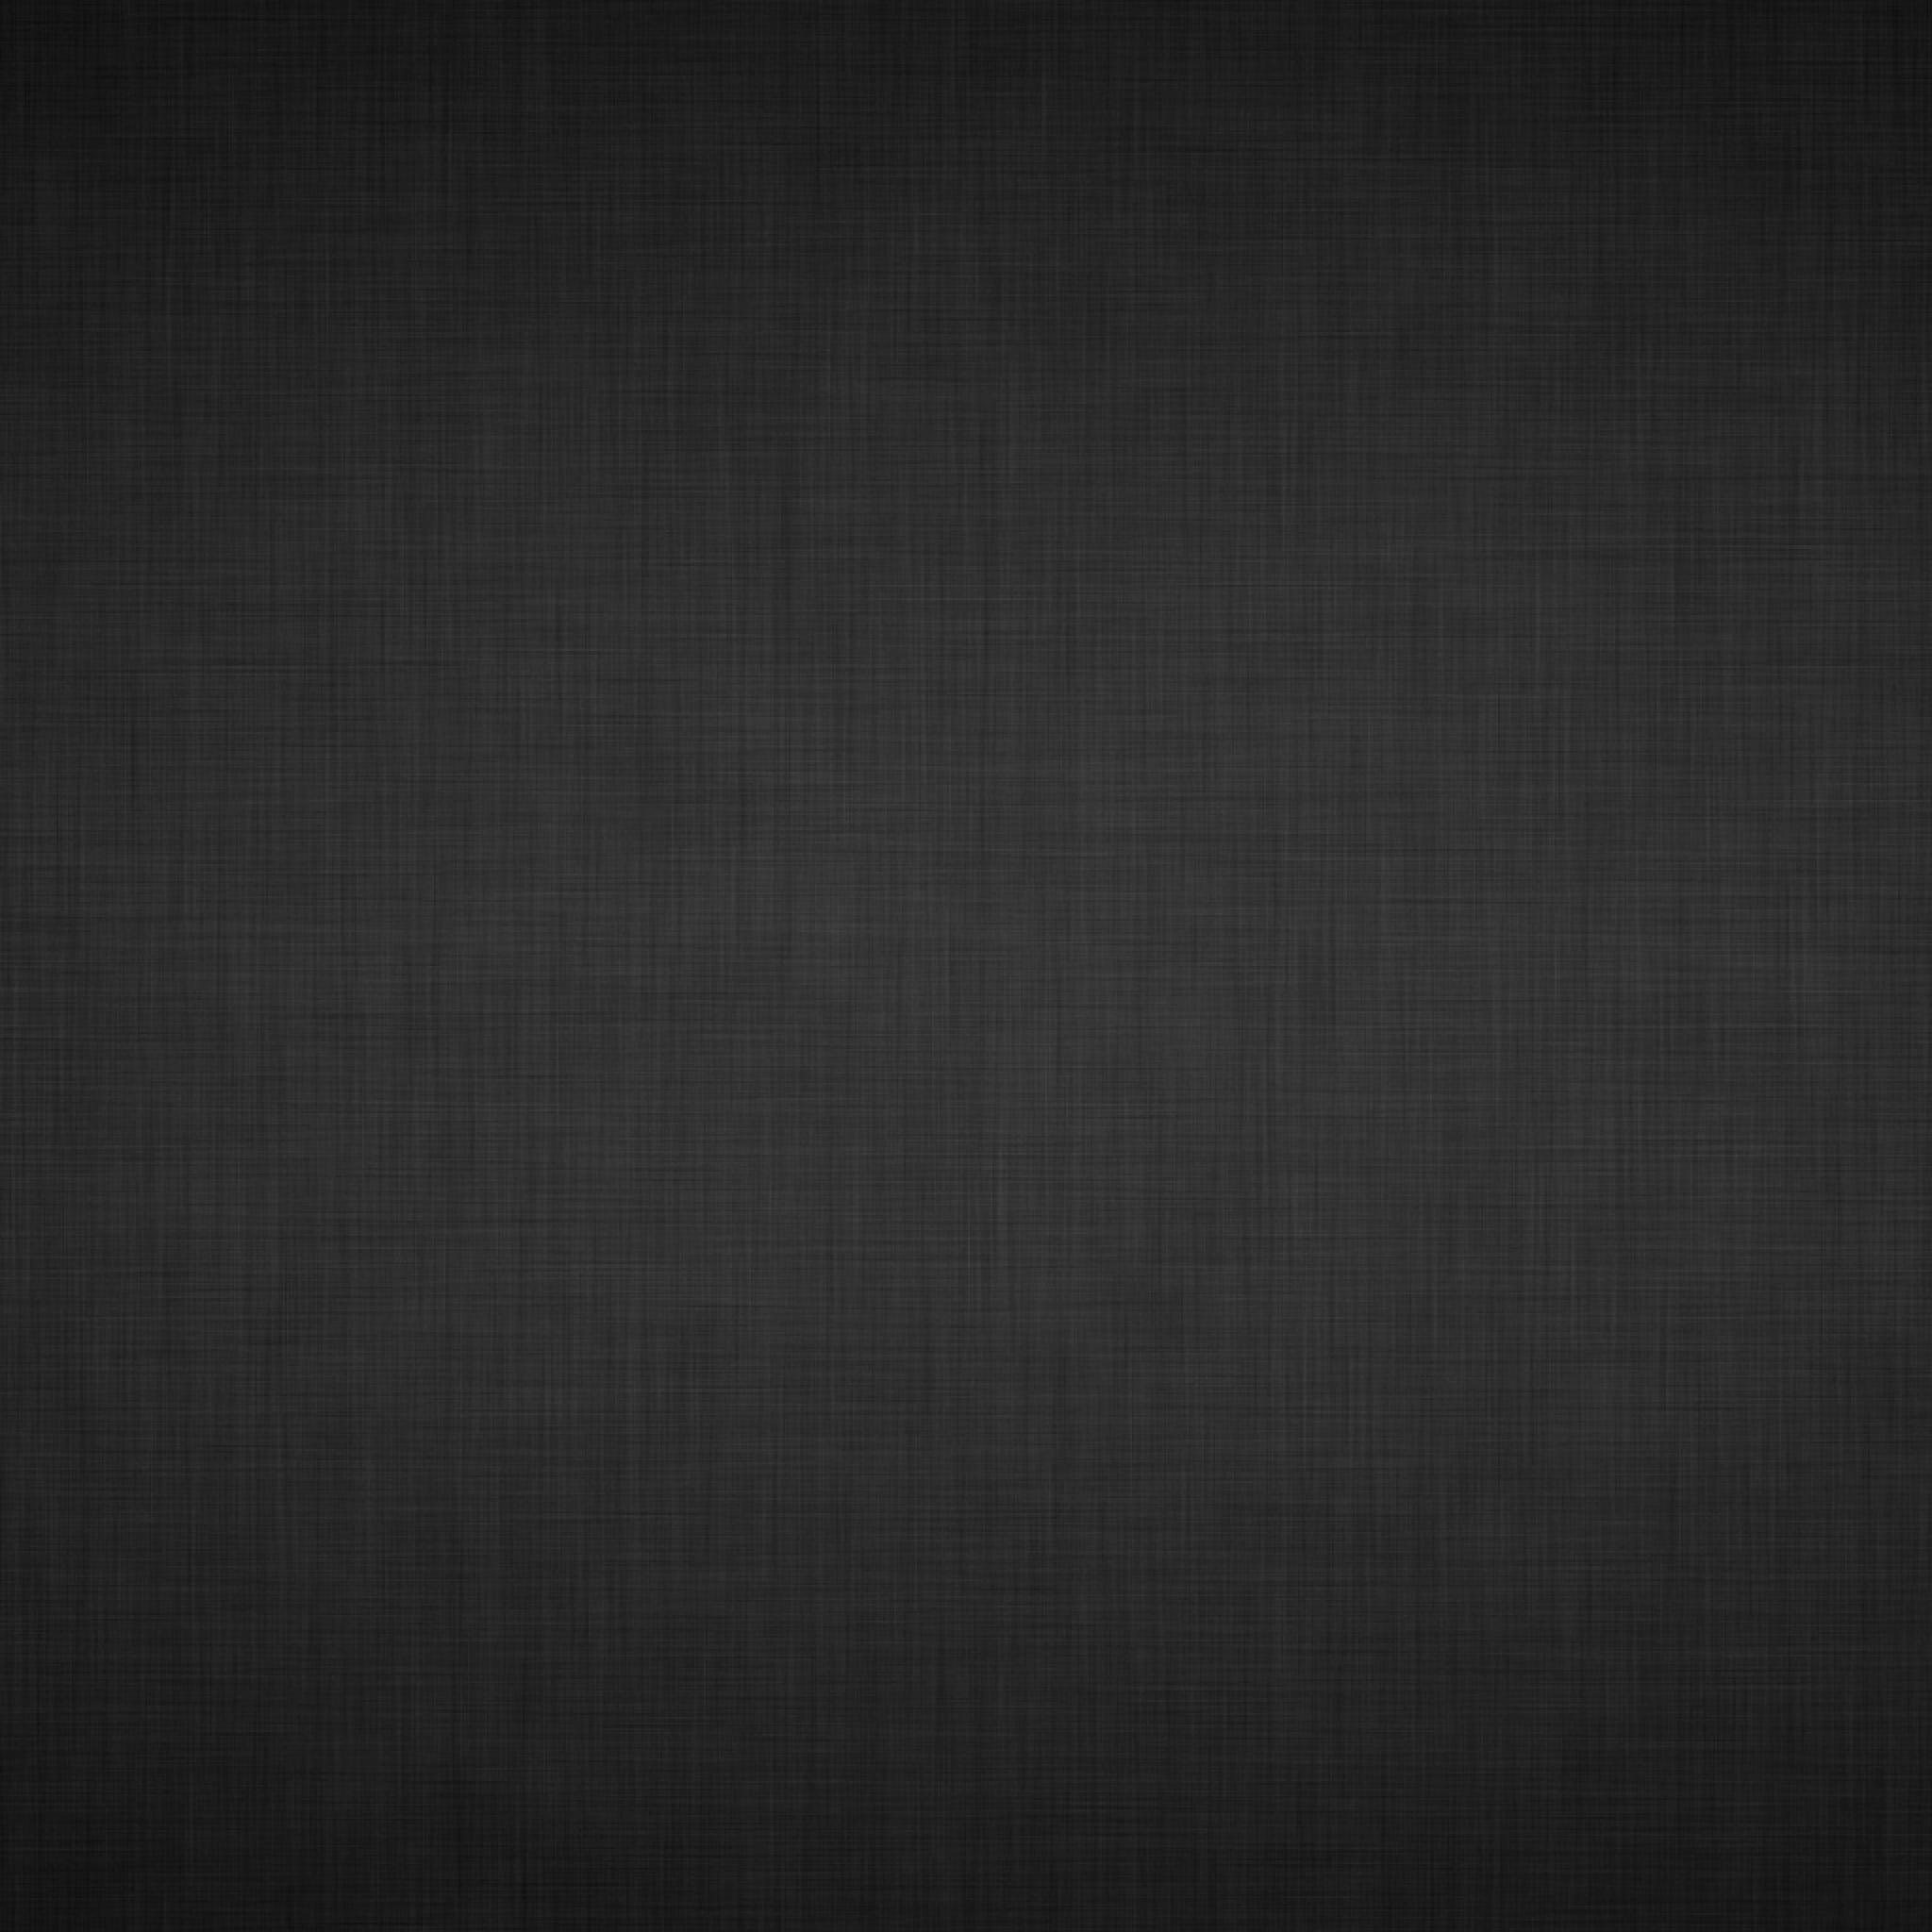 live wallpaper for ipad mini wallpapersafari